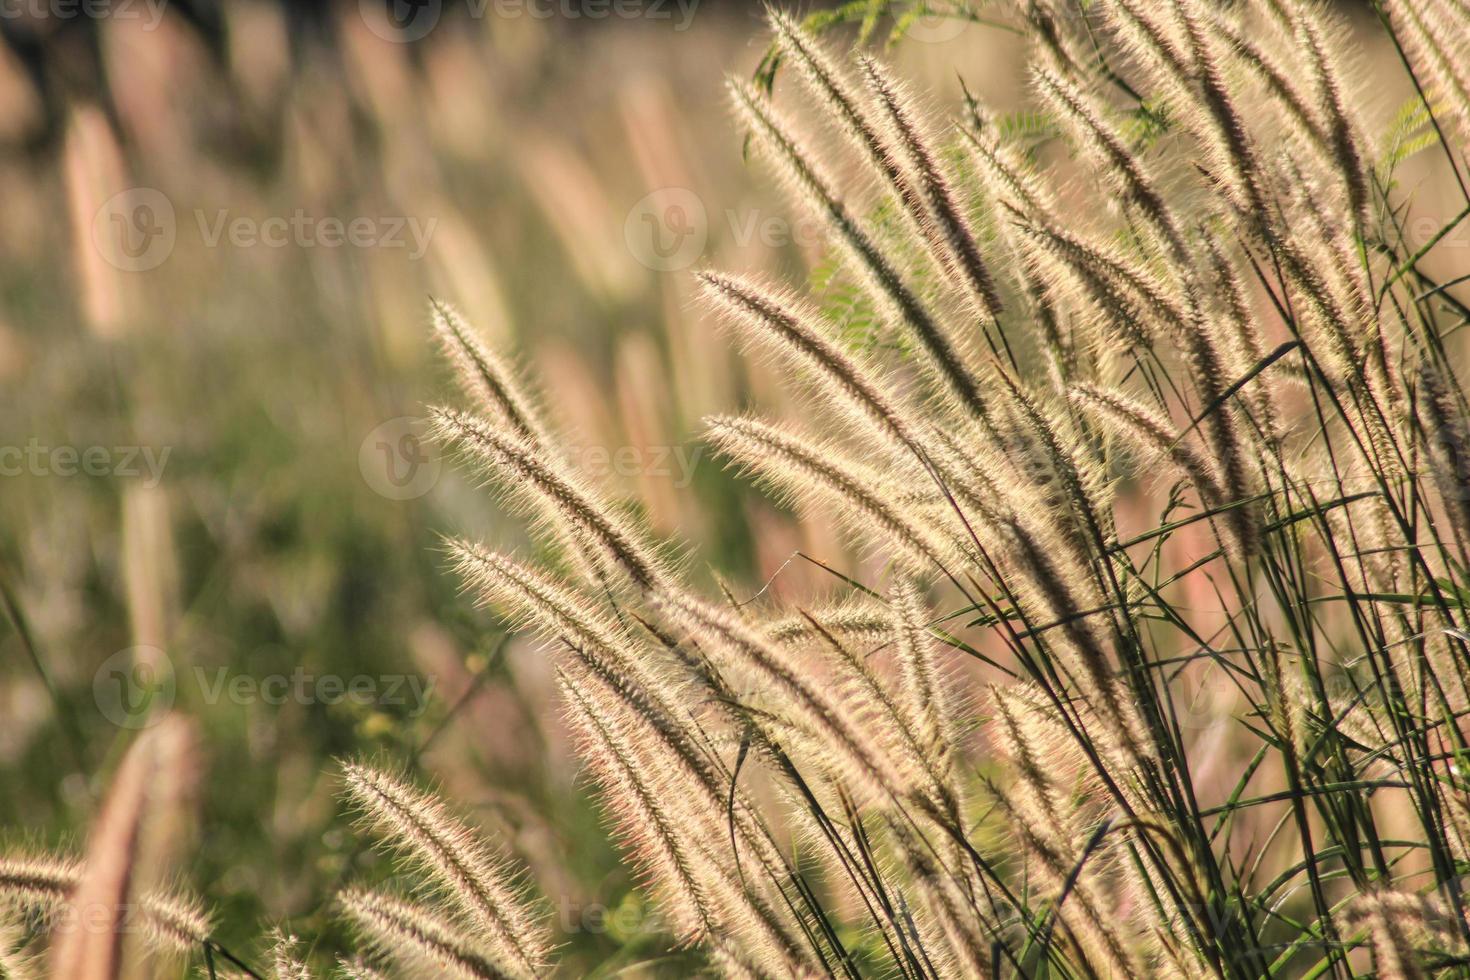 Flowering grass photo